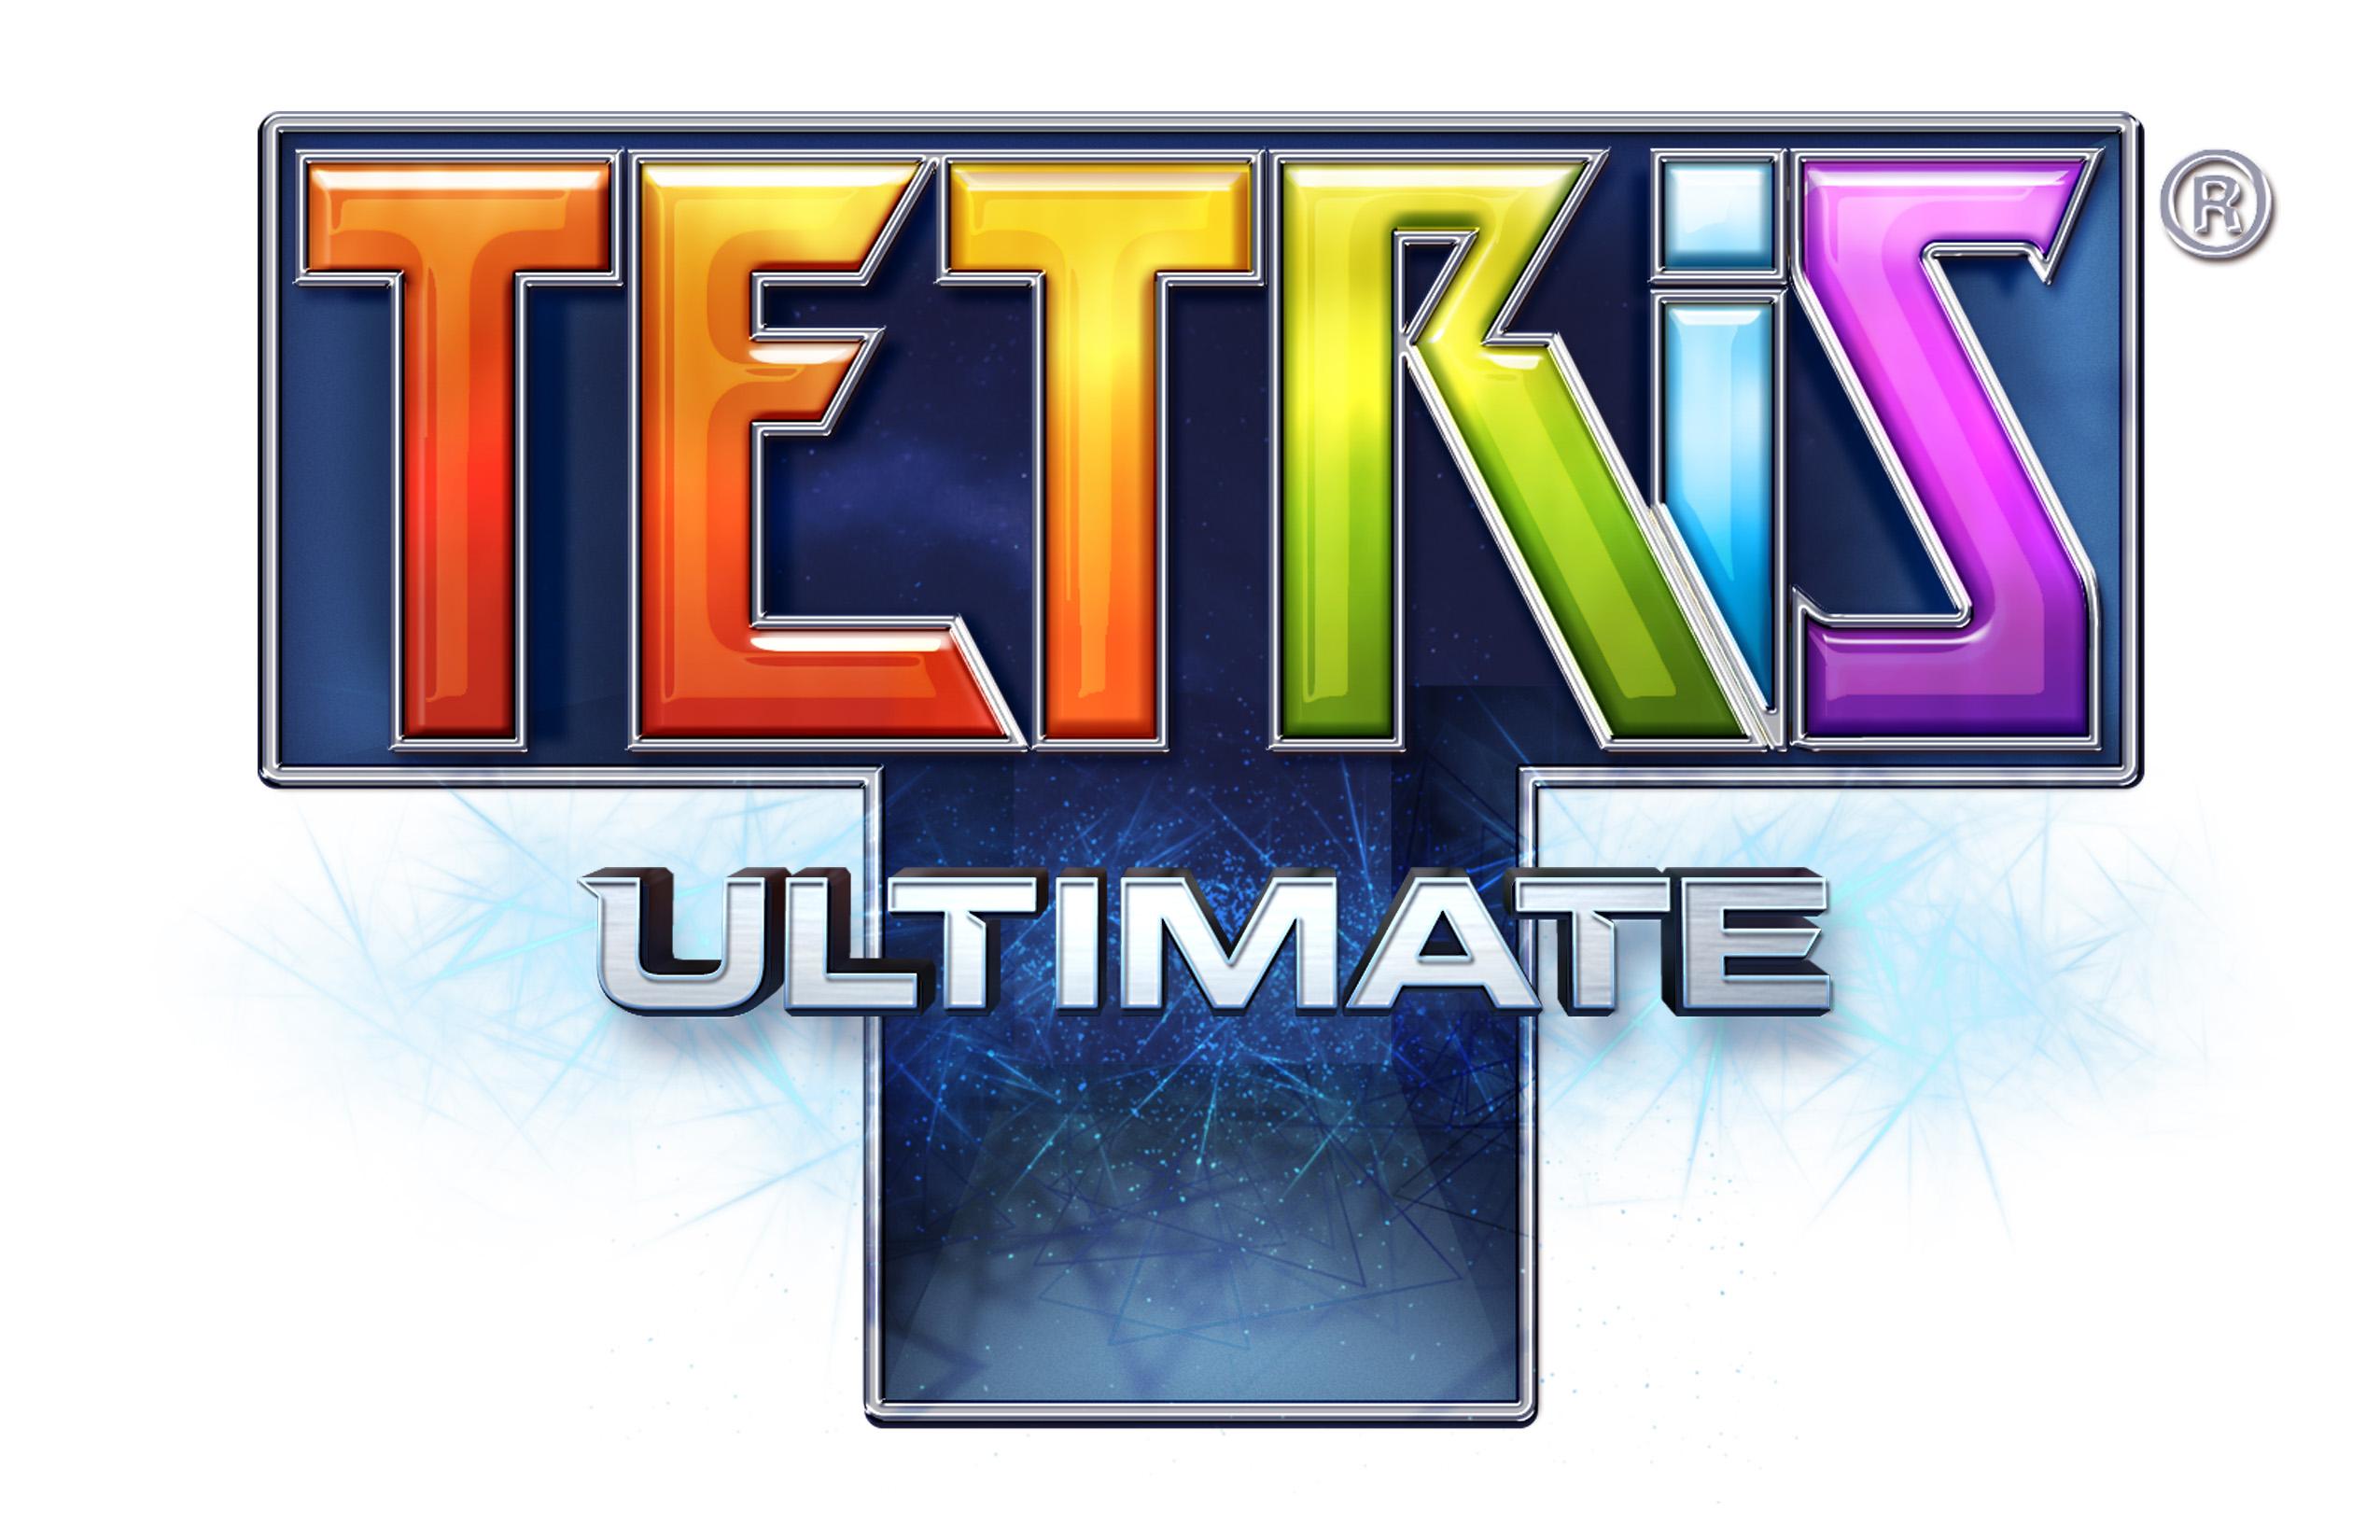 Ubisoft Announce Tetris Ultimate